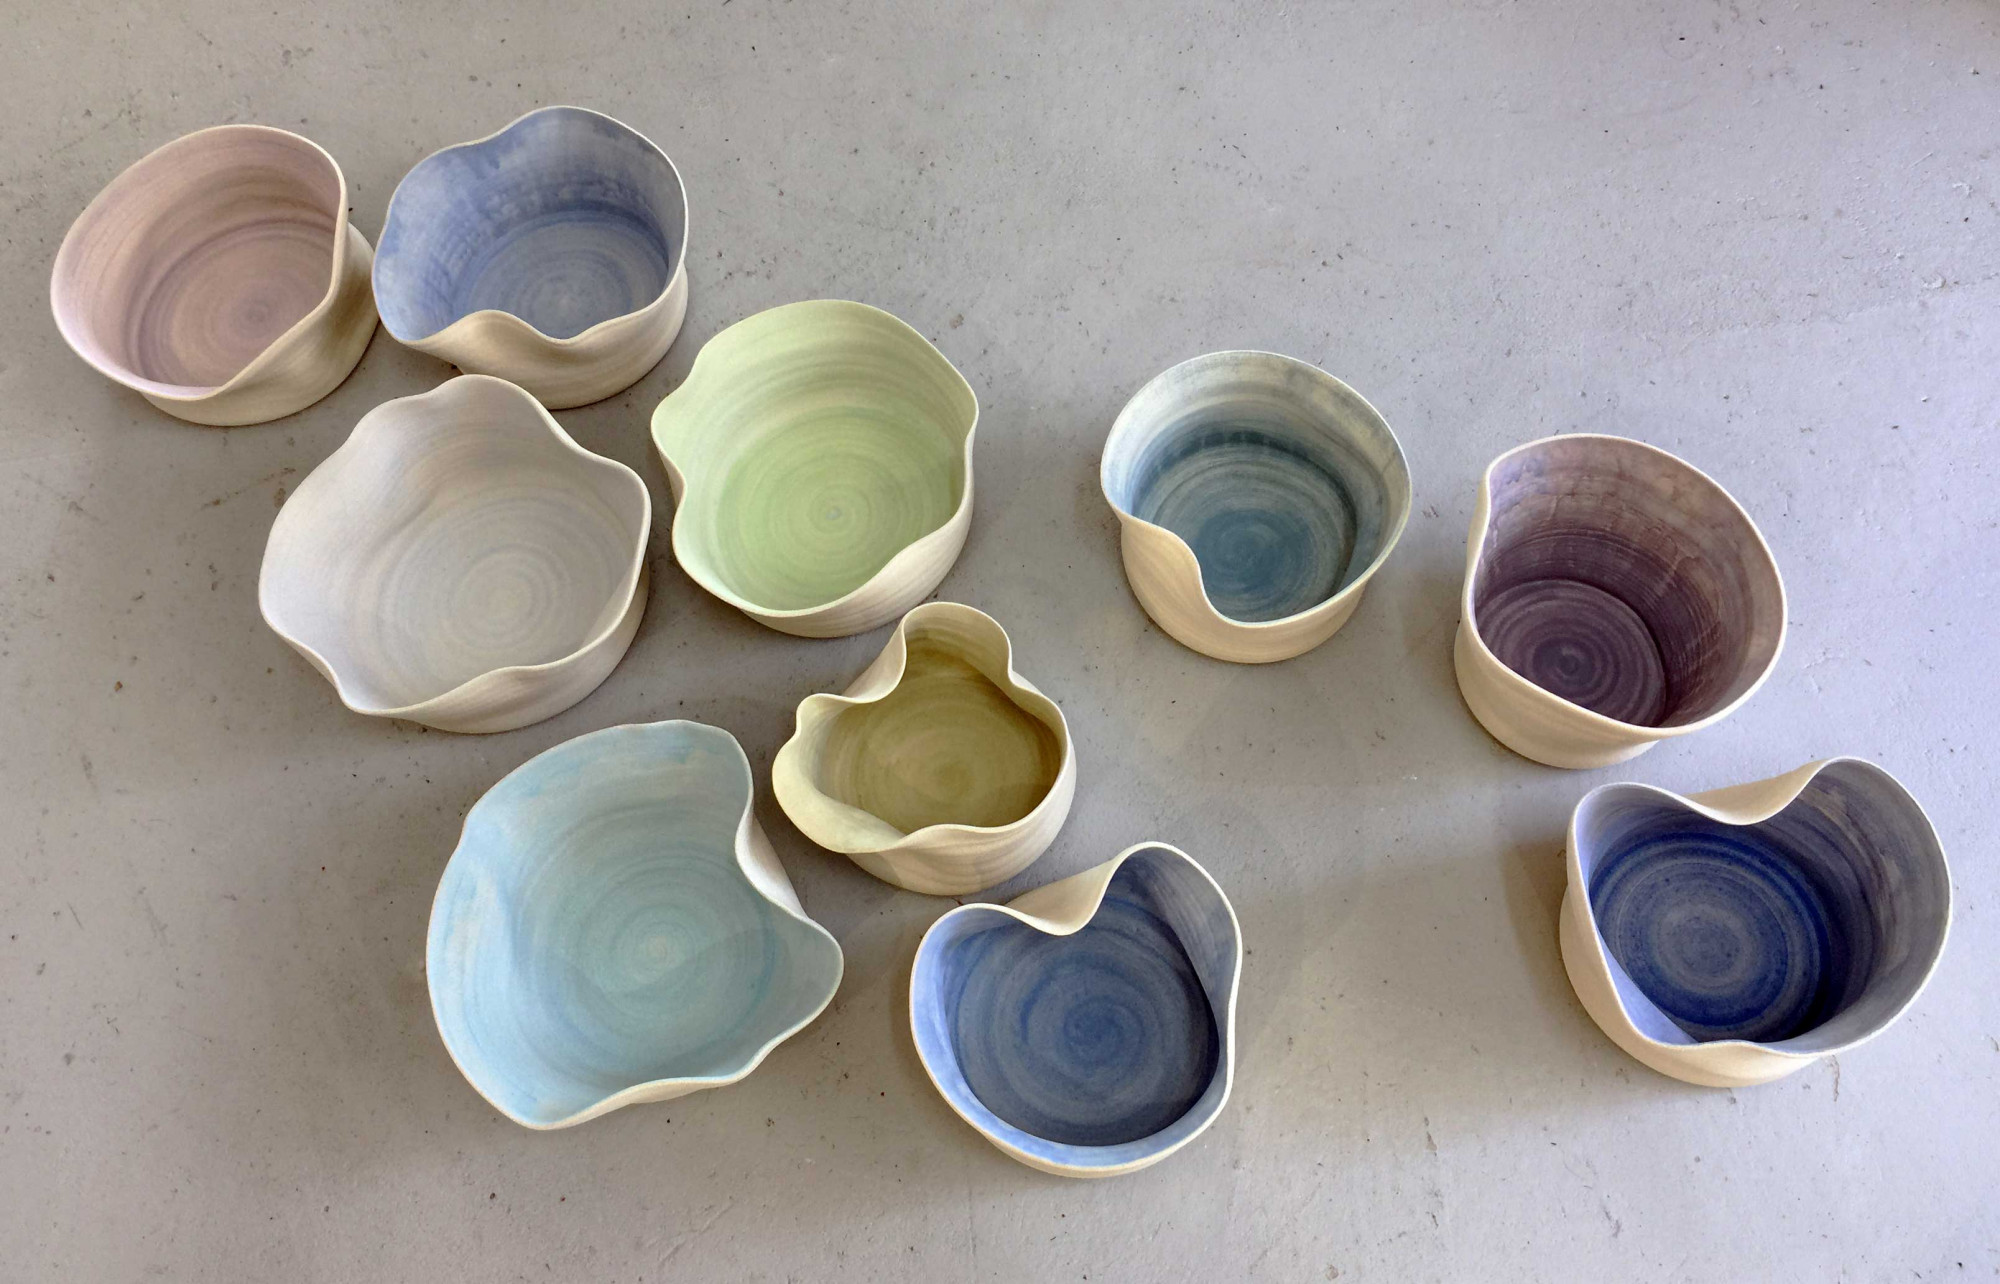 Floating Bowls 2019, Ceramics by Kerrie Warren